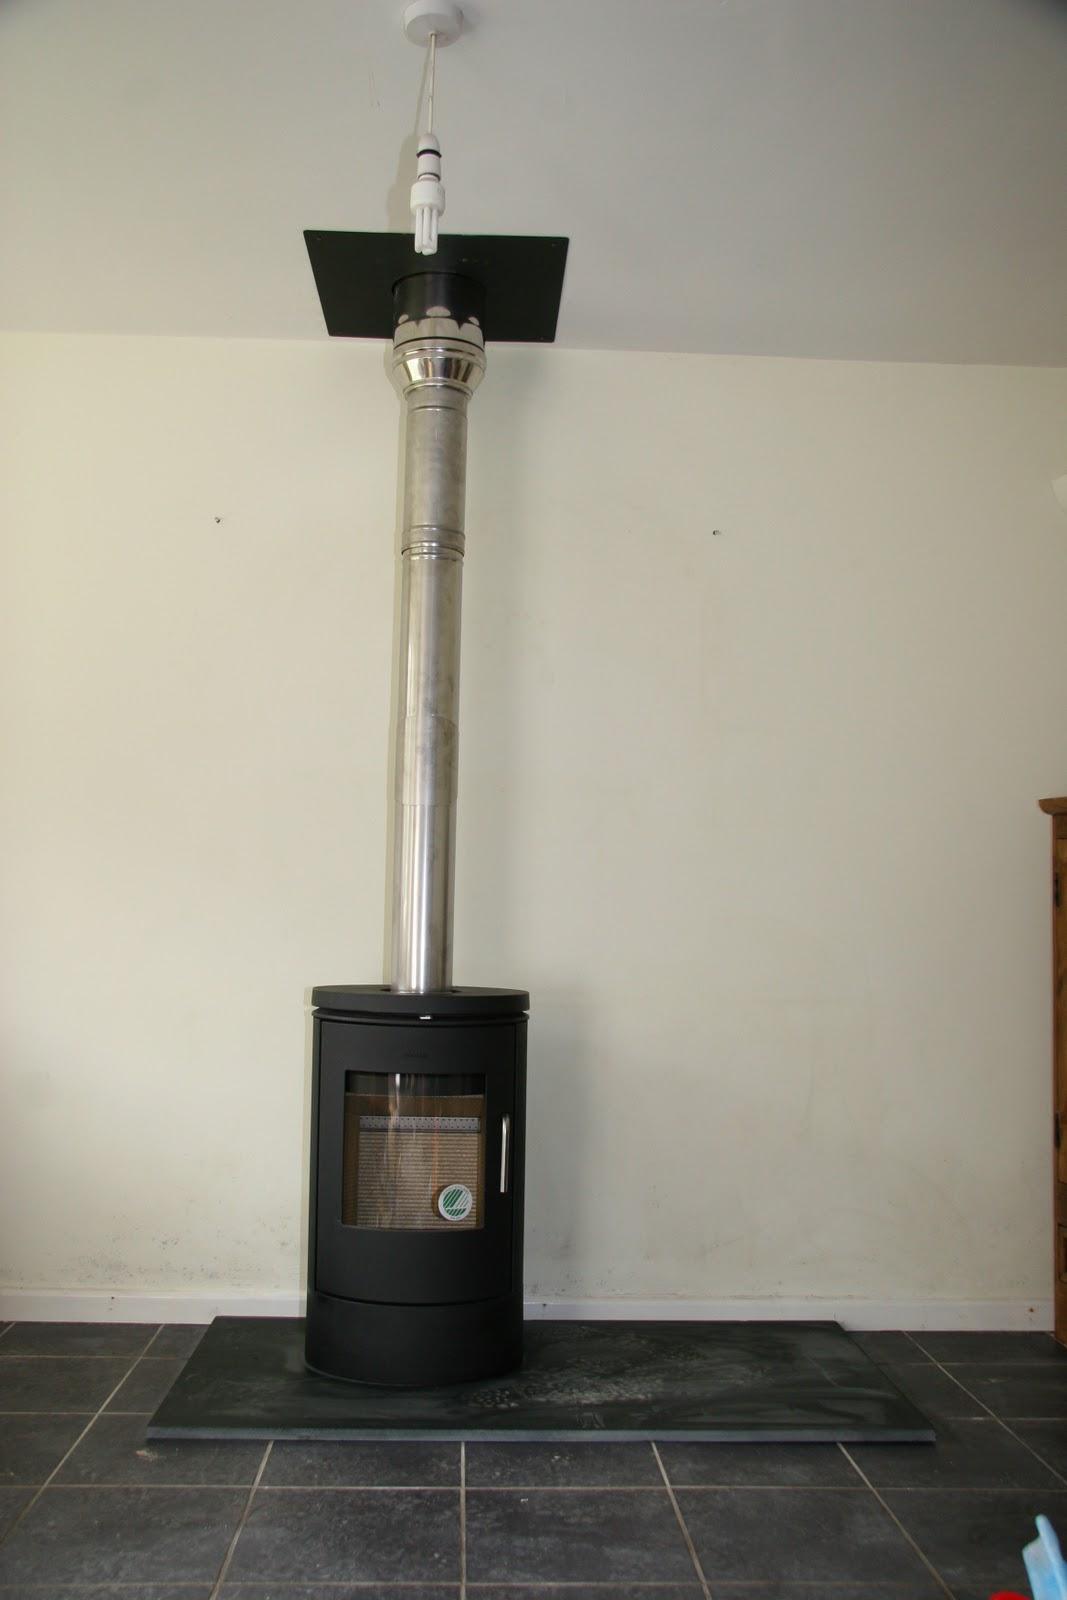 Redwood Stoves Ltd Cornwall: Morso 6140 wood burning stove